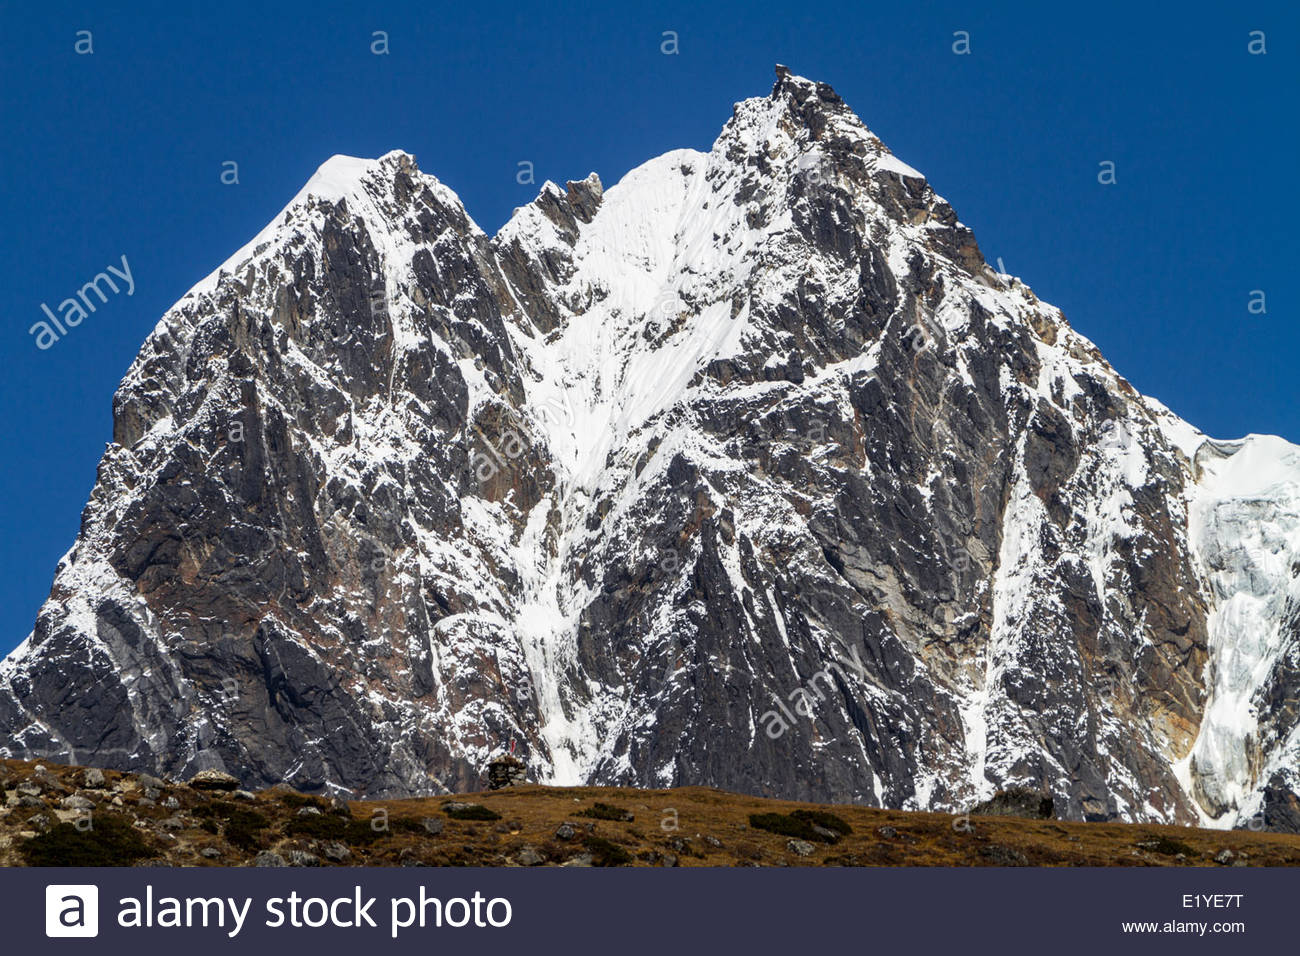 Memorial Stupa And Himalaya Peak, Nepal - Stock Image